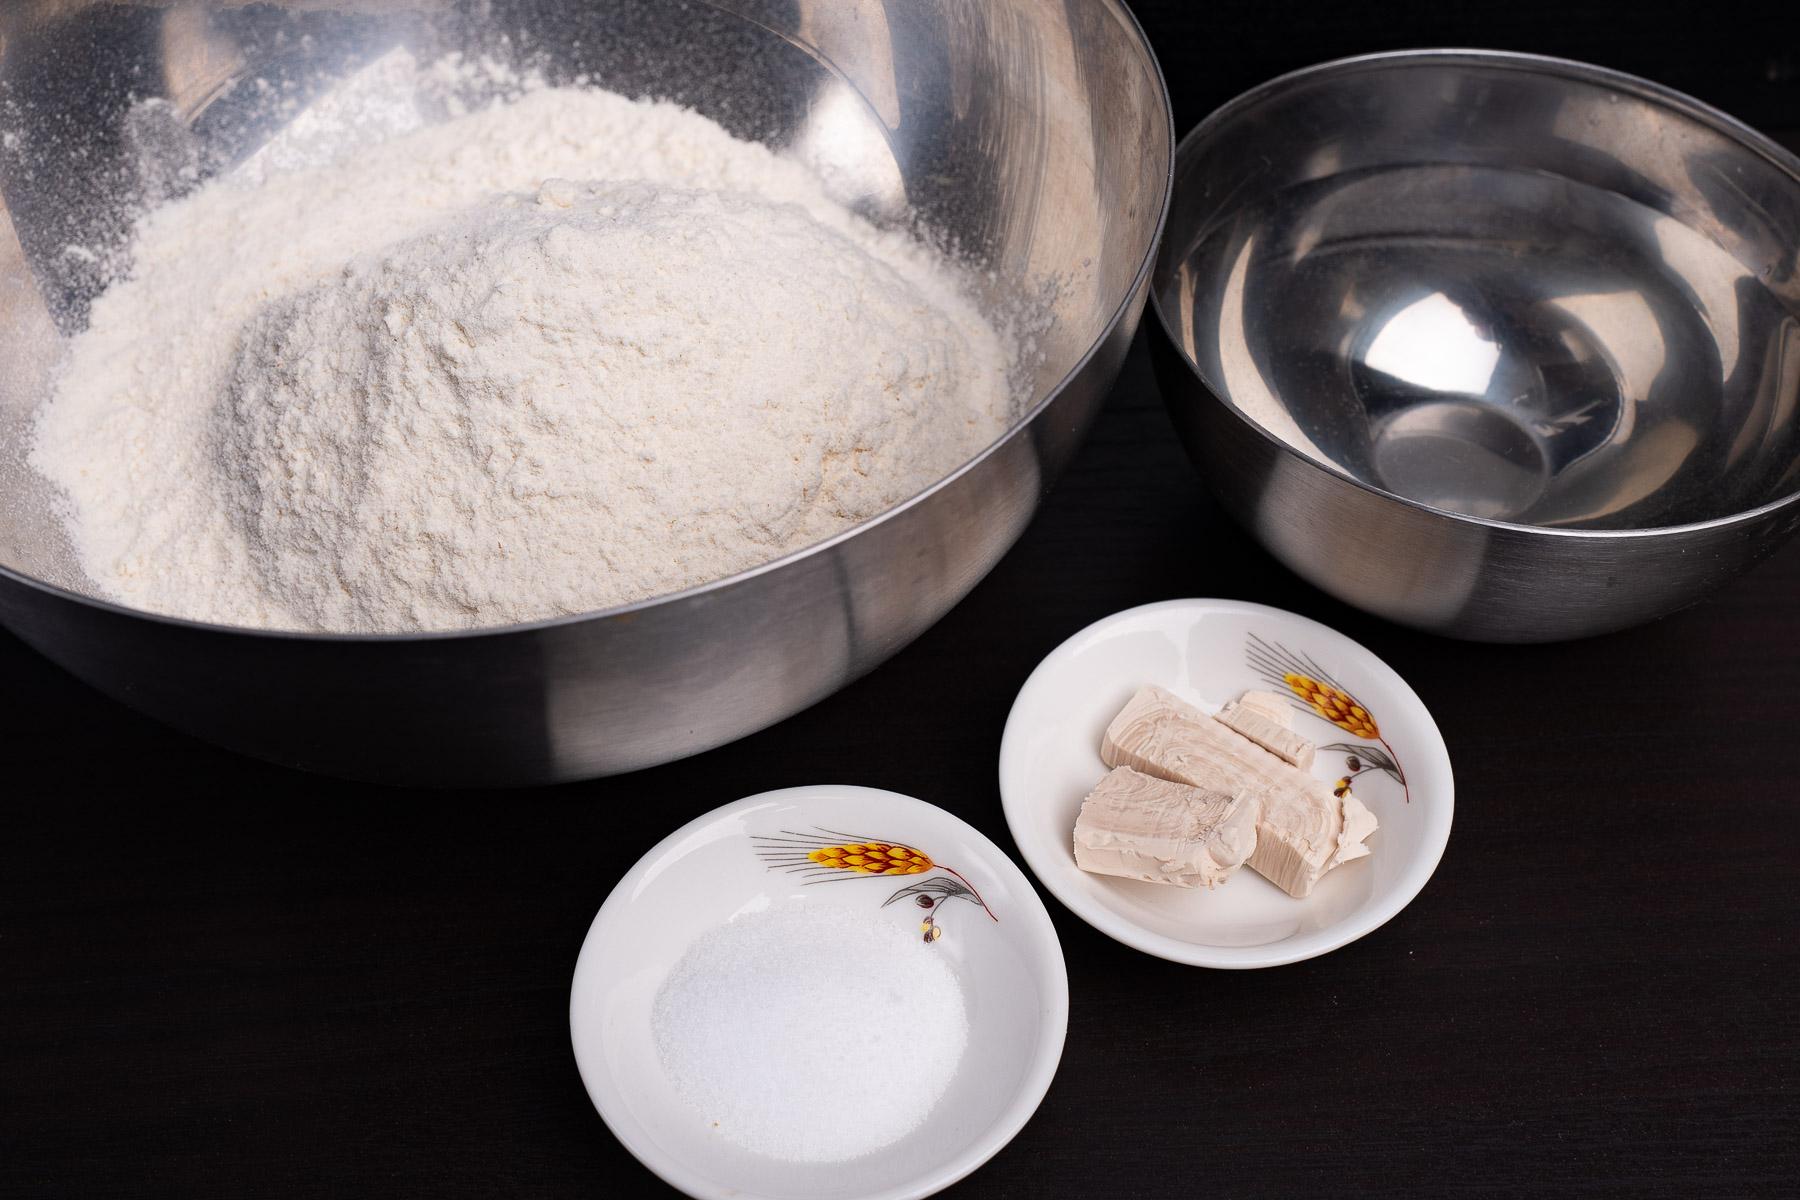 składniki na ciasto - mąka, woda, drożdże, sól